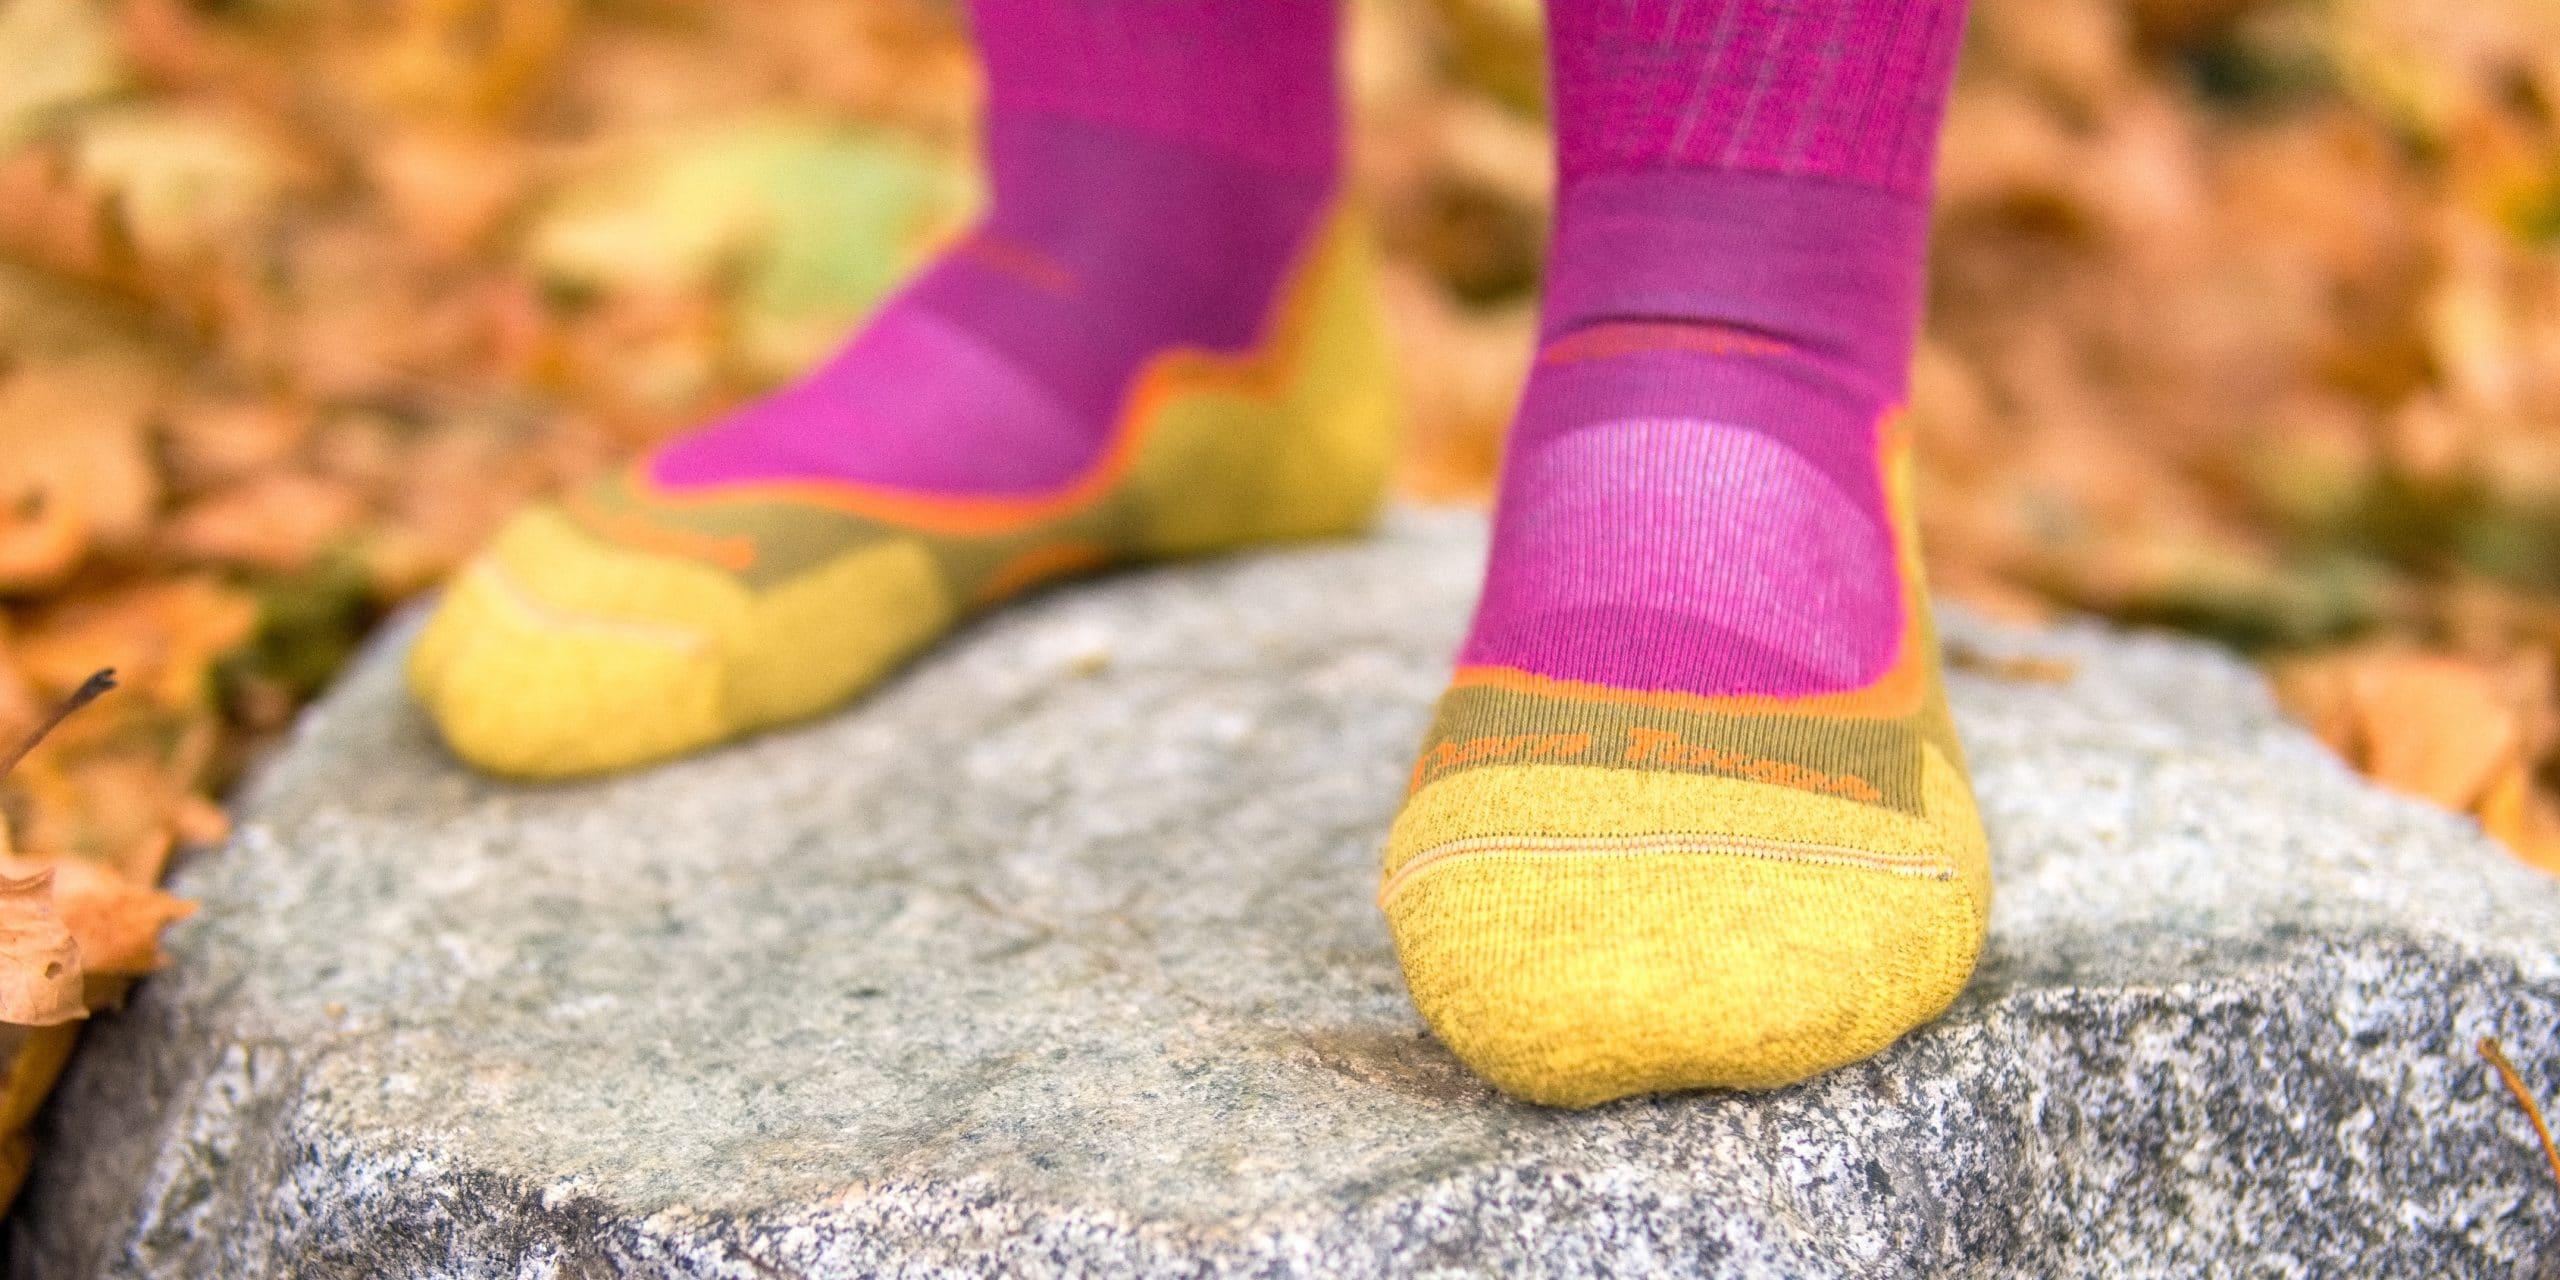 wirecutter hiking-socks-2x1-fullres03902